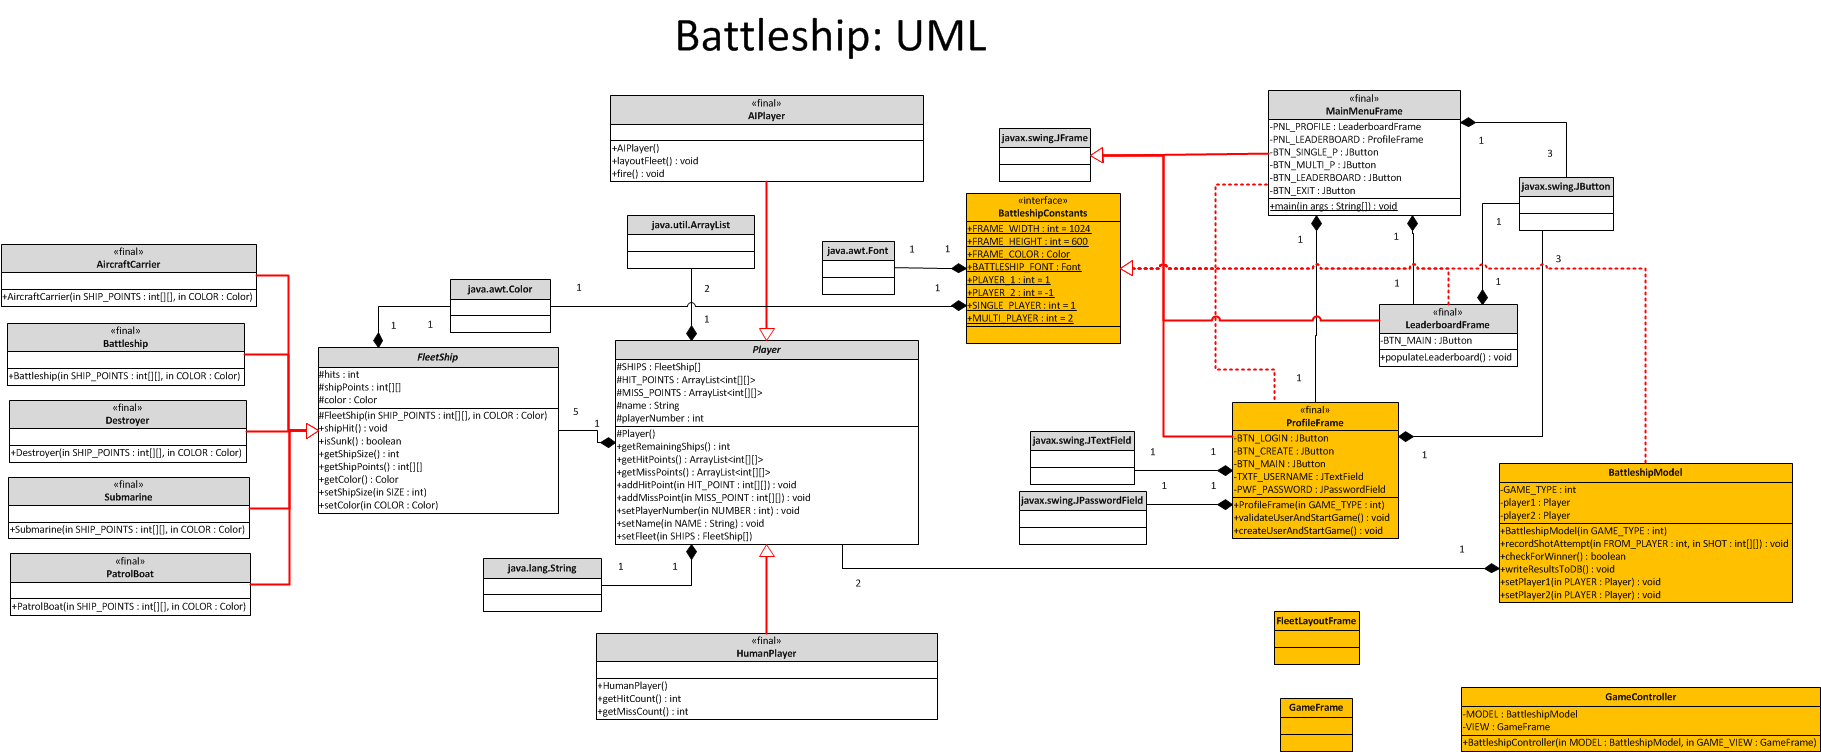 Battleship analysis phase uml preliminary version 03 cst battleship analysis phase uml preliminary version 03 ccuart Choice Image